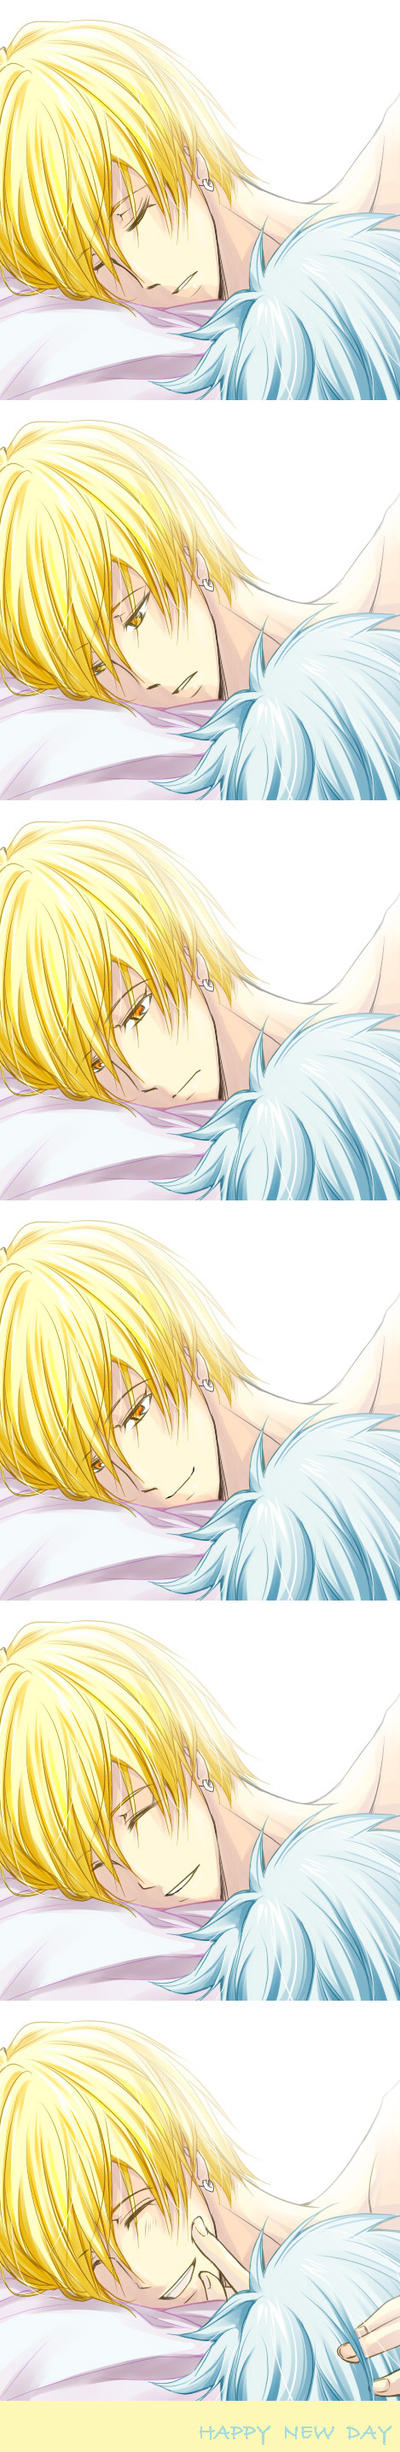 [Kise x Kuroko] GOOD MORNING by ryuuhta